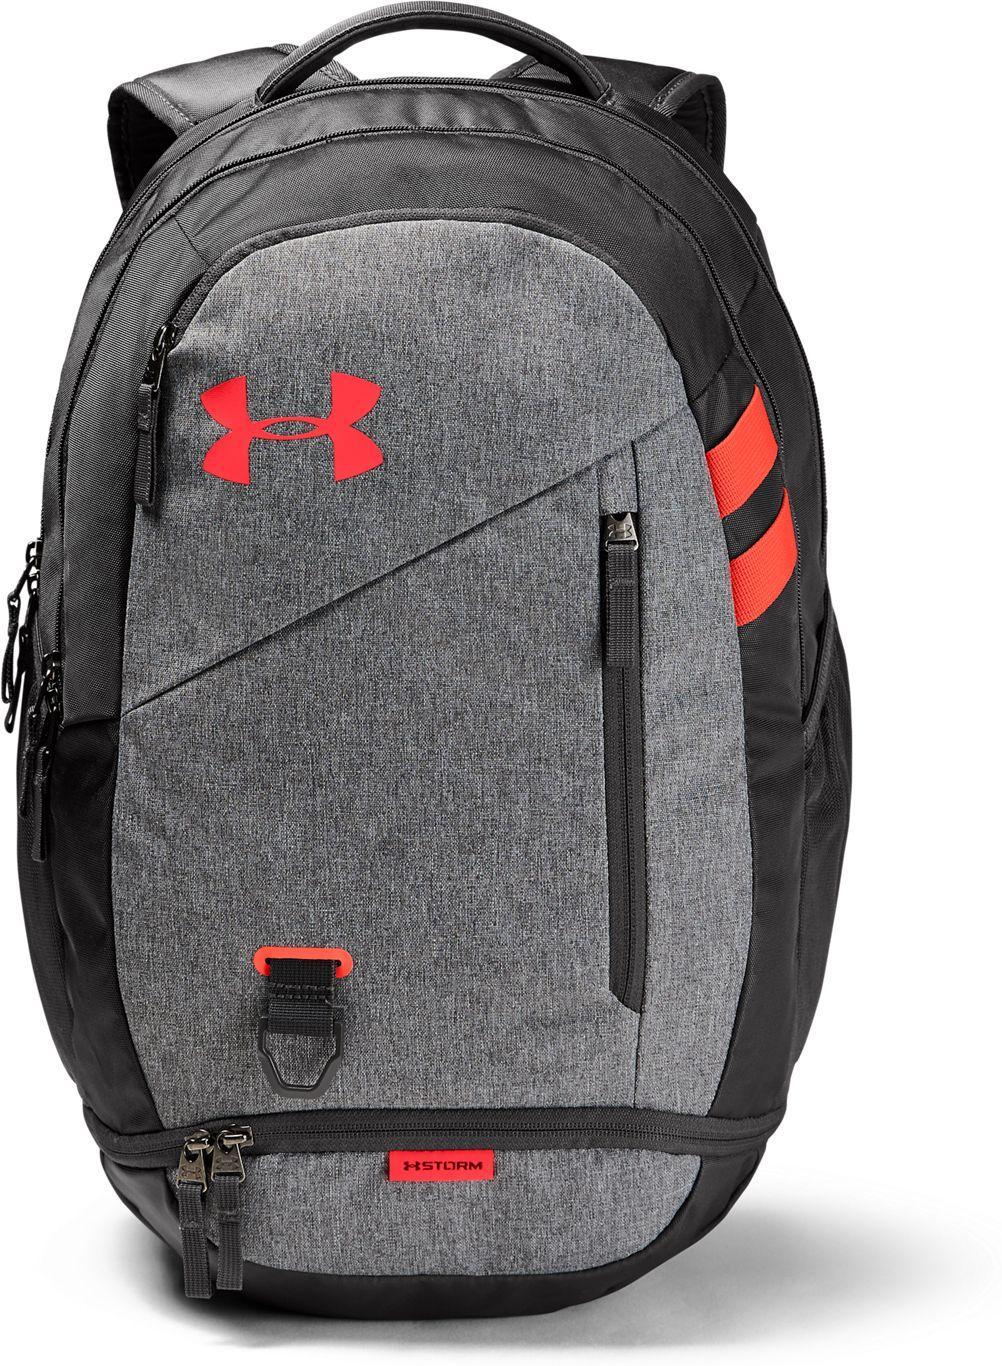 Rucsac Under Armour UA Hustle 4.0 Backpack